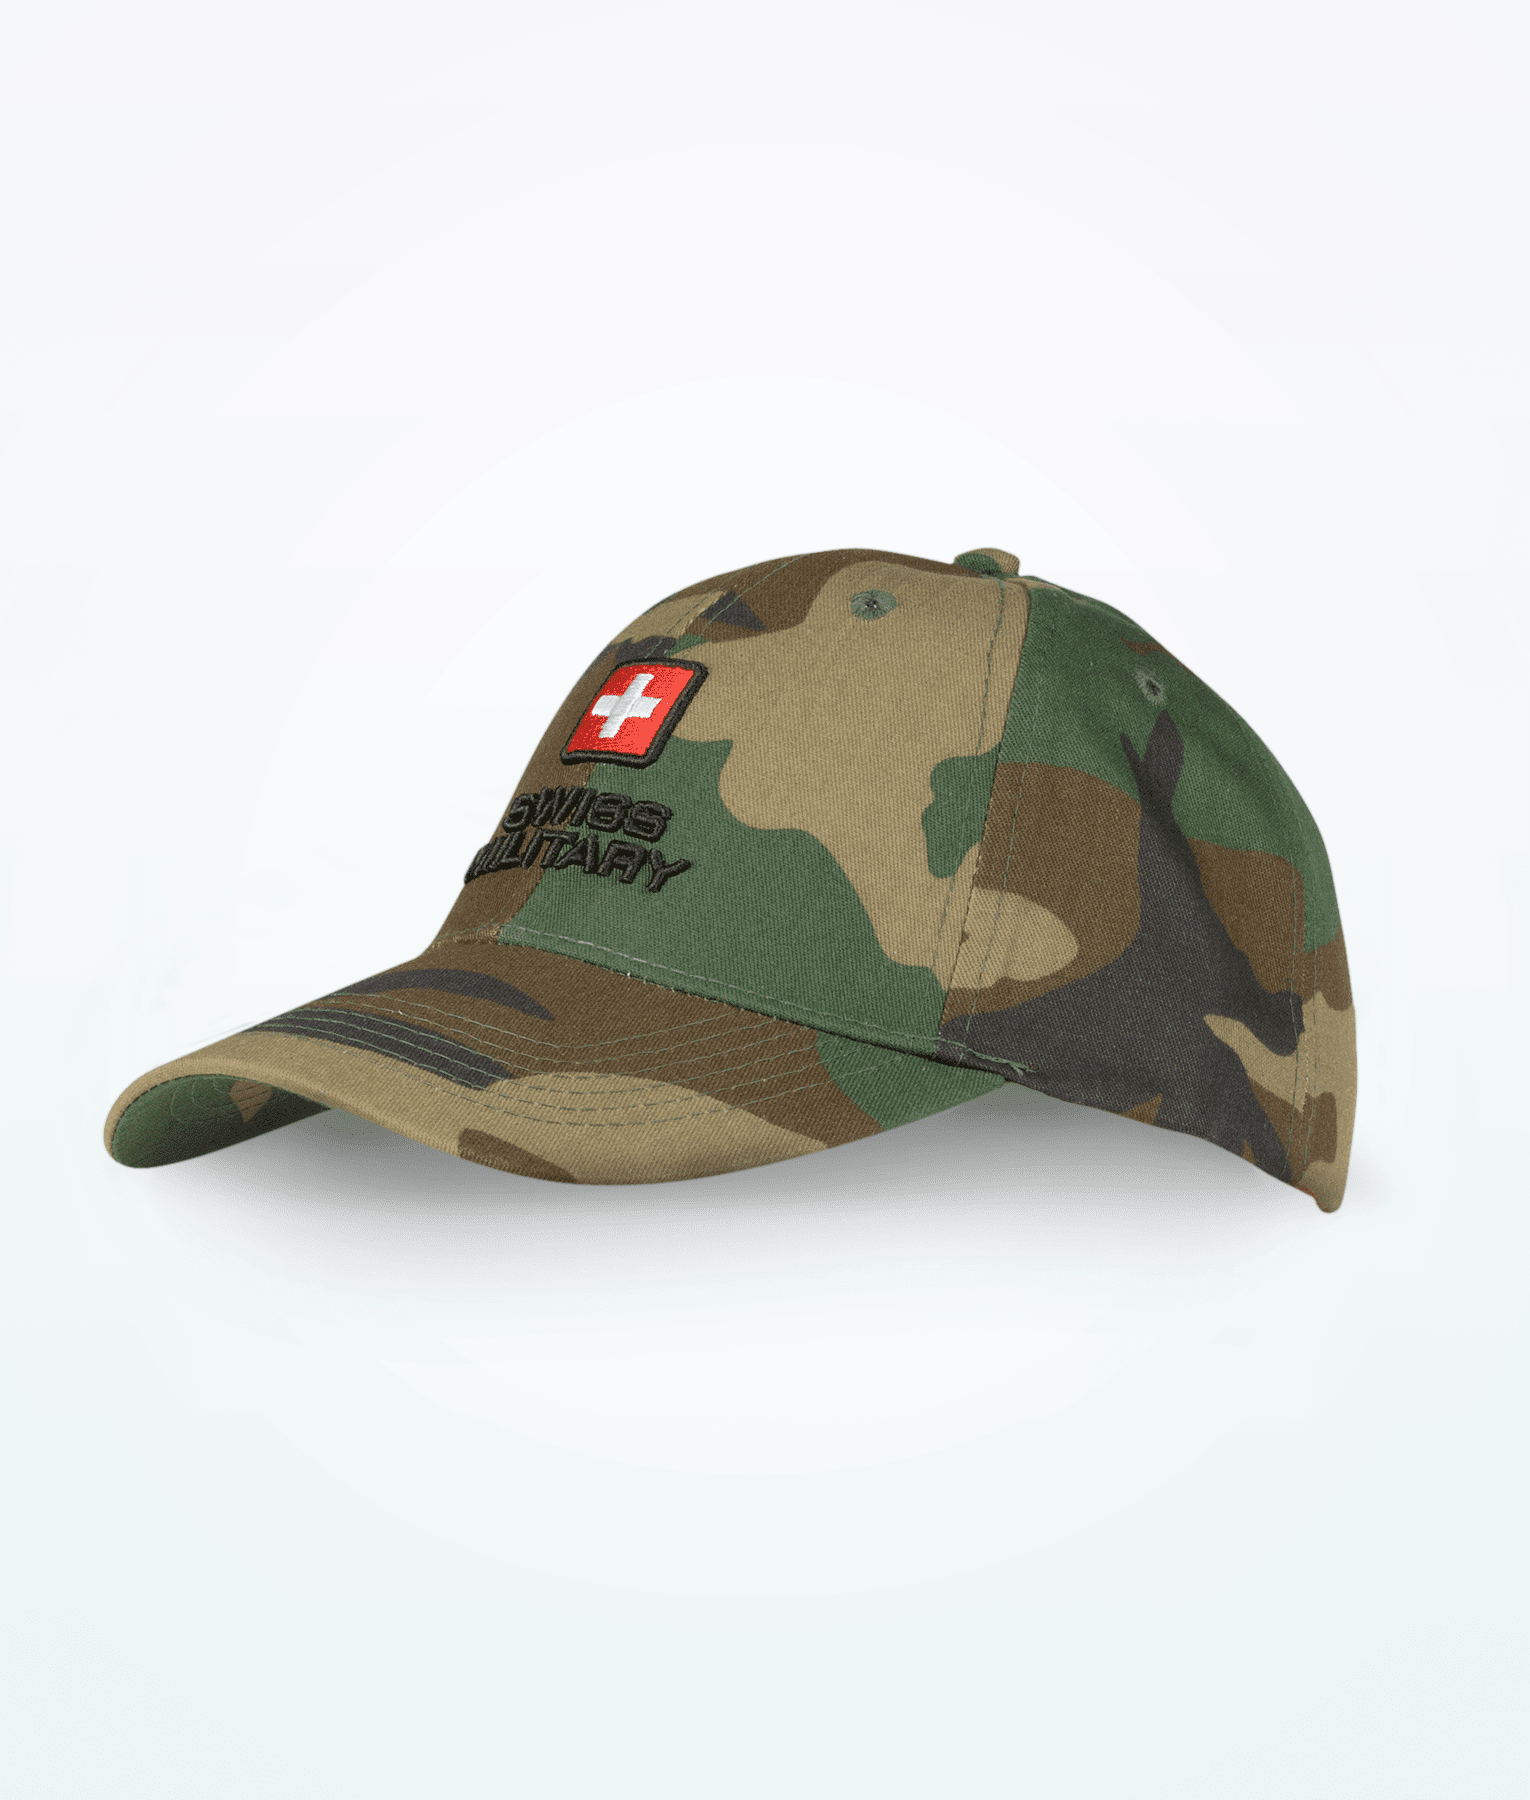 5744b38f1e7d6 Swiss Military Baseball Cap - Swiss Made Direct